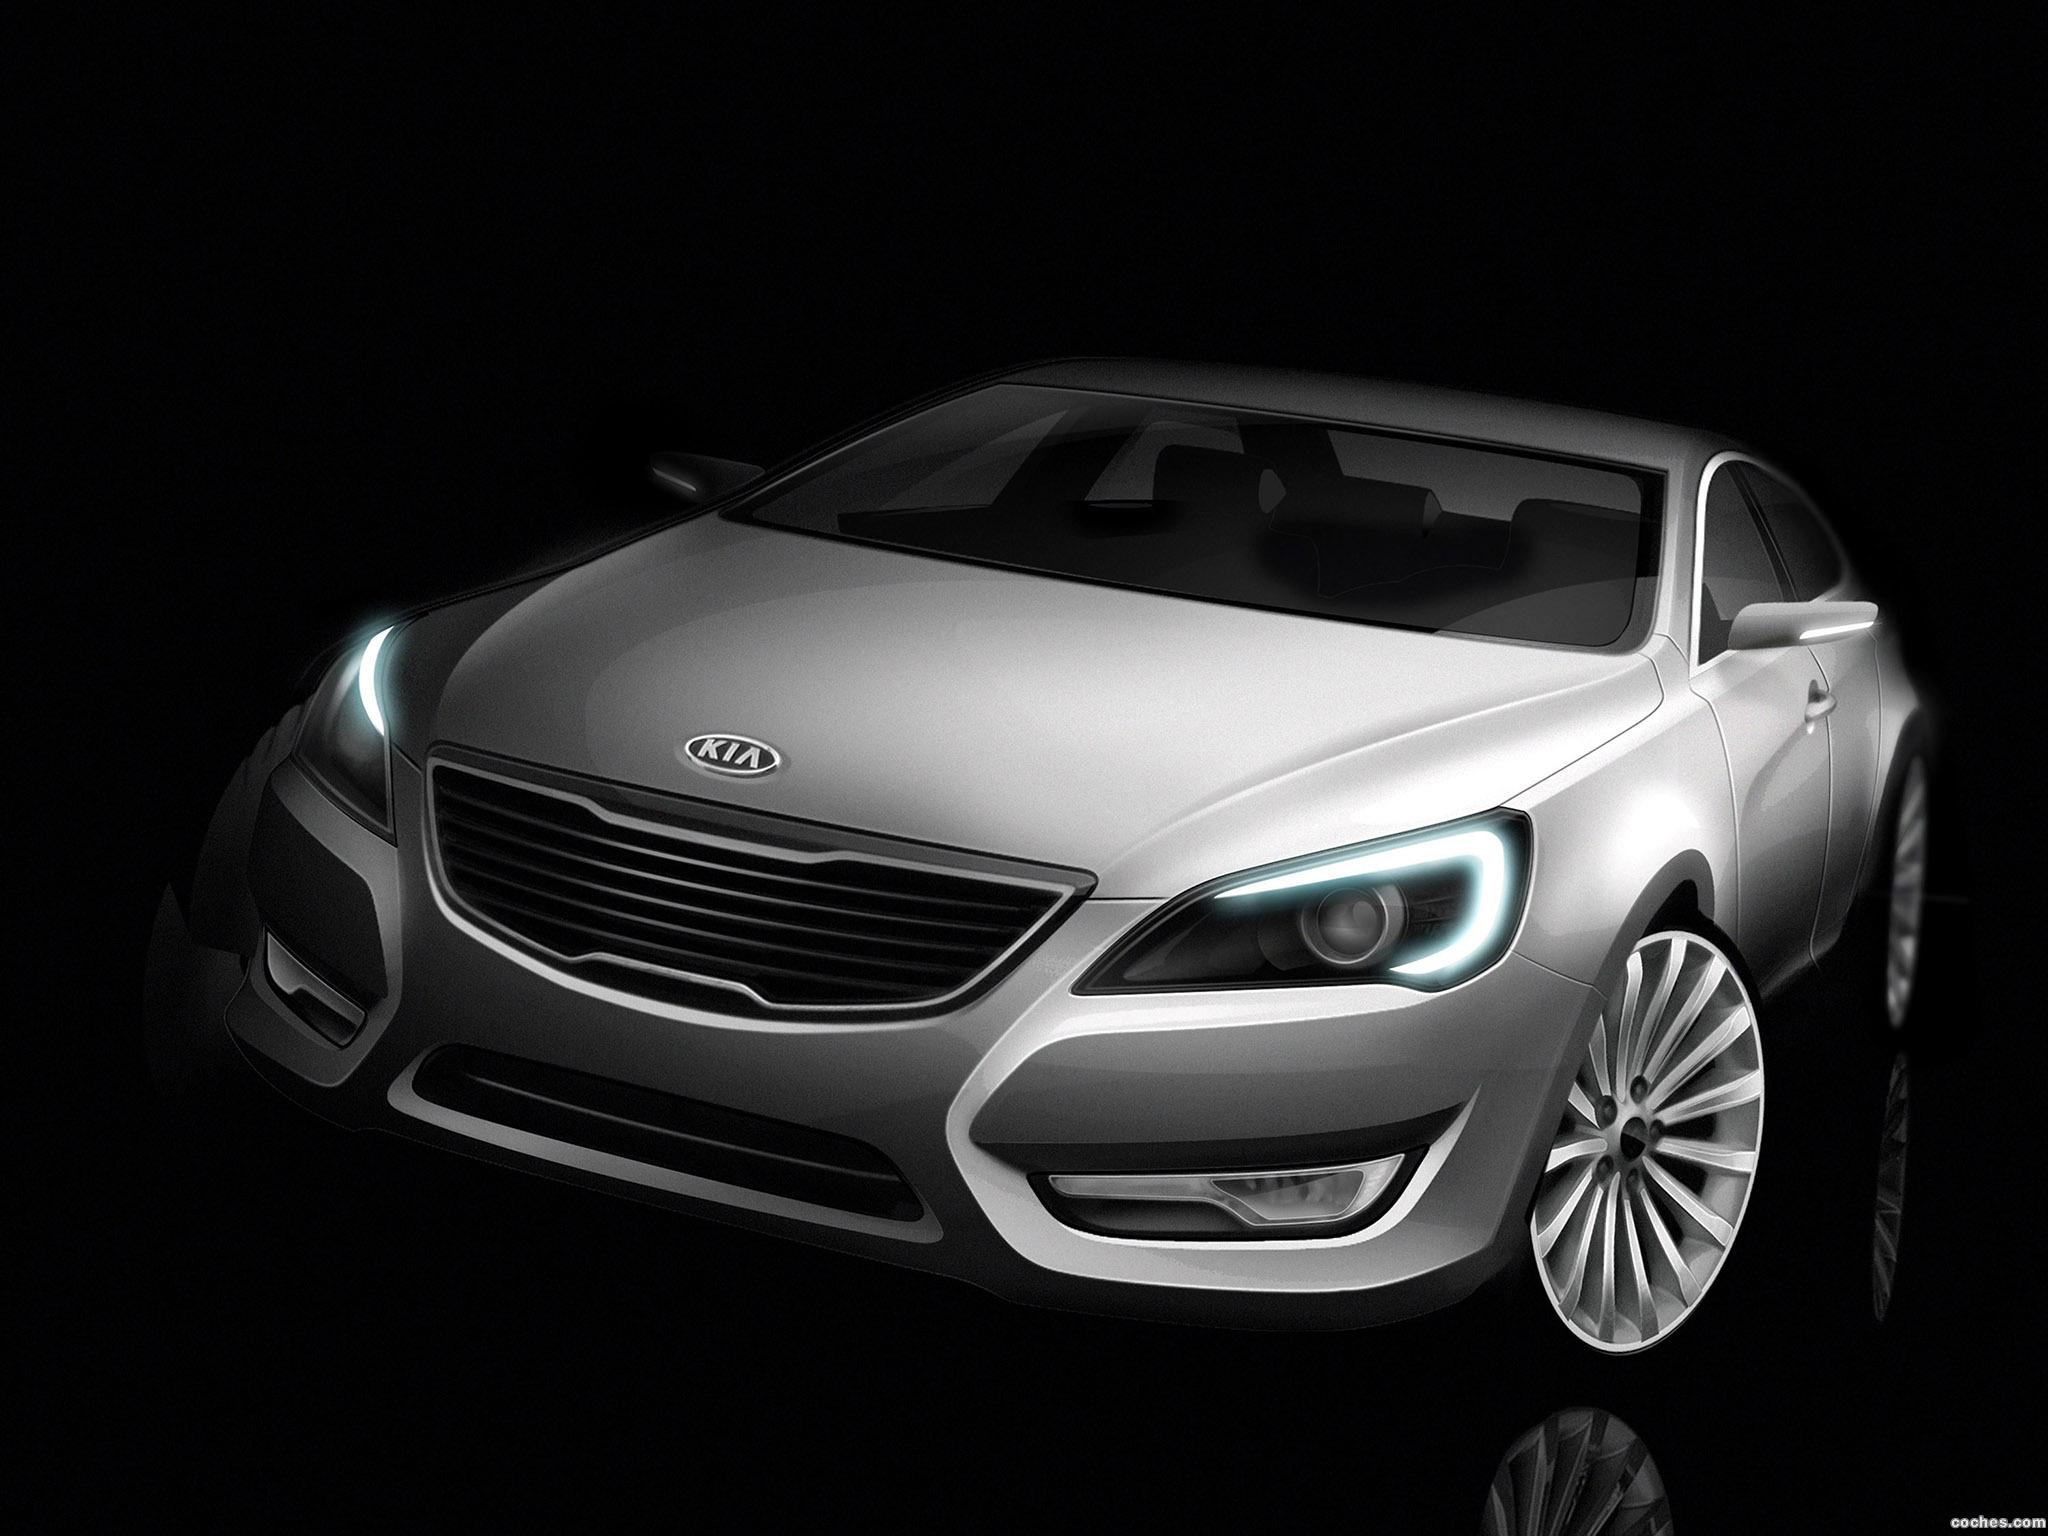 Foto 0 de Kia VG Concept 2009